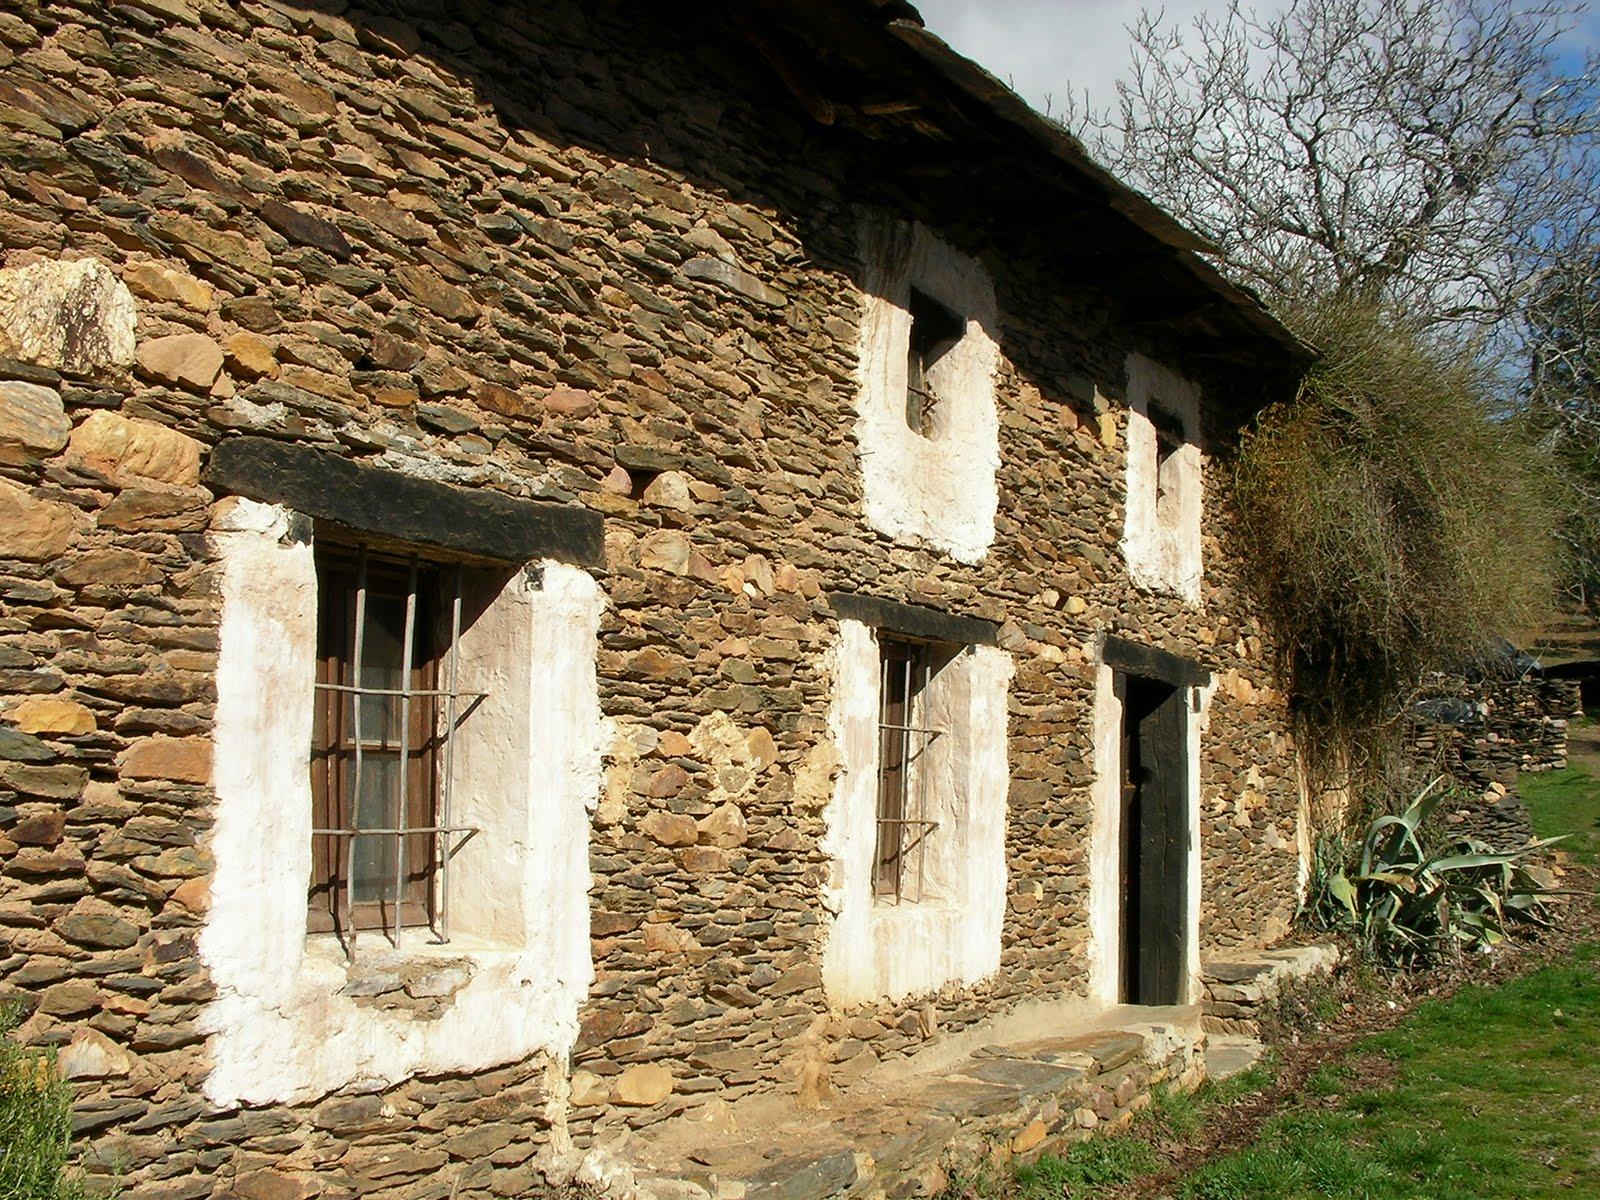 La vereda guadalajara la casa del secretario en la vereda - Casas de pueblo en guadalajara ...